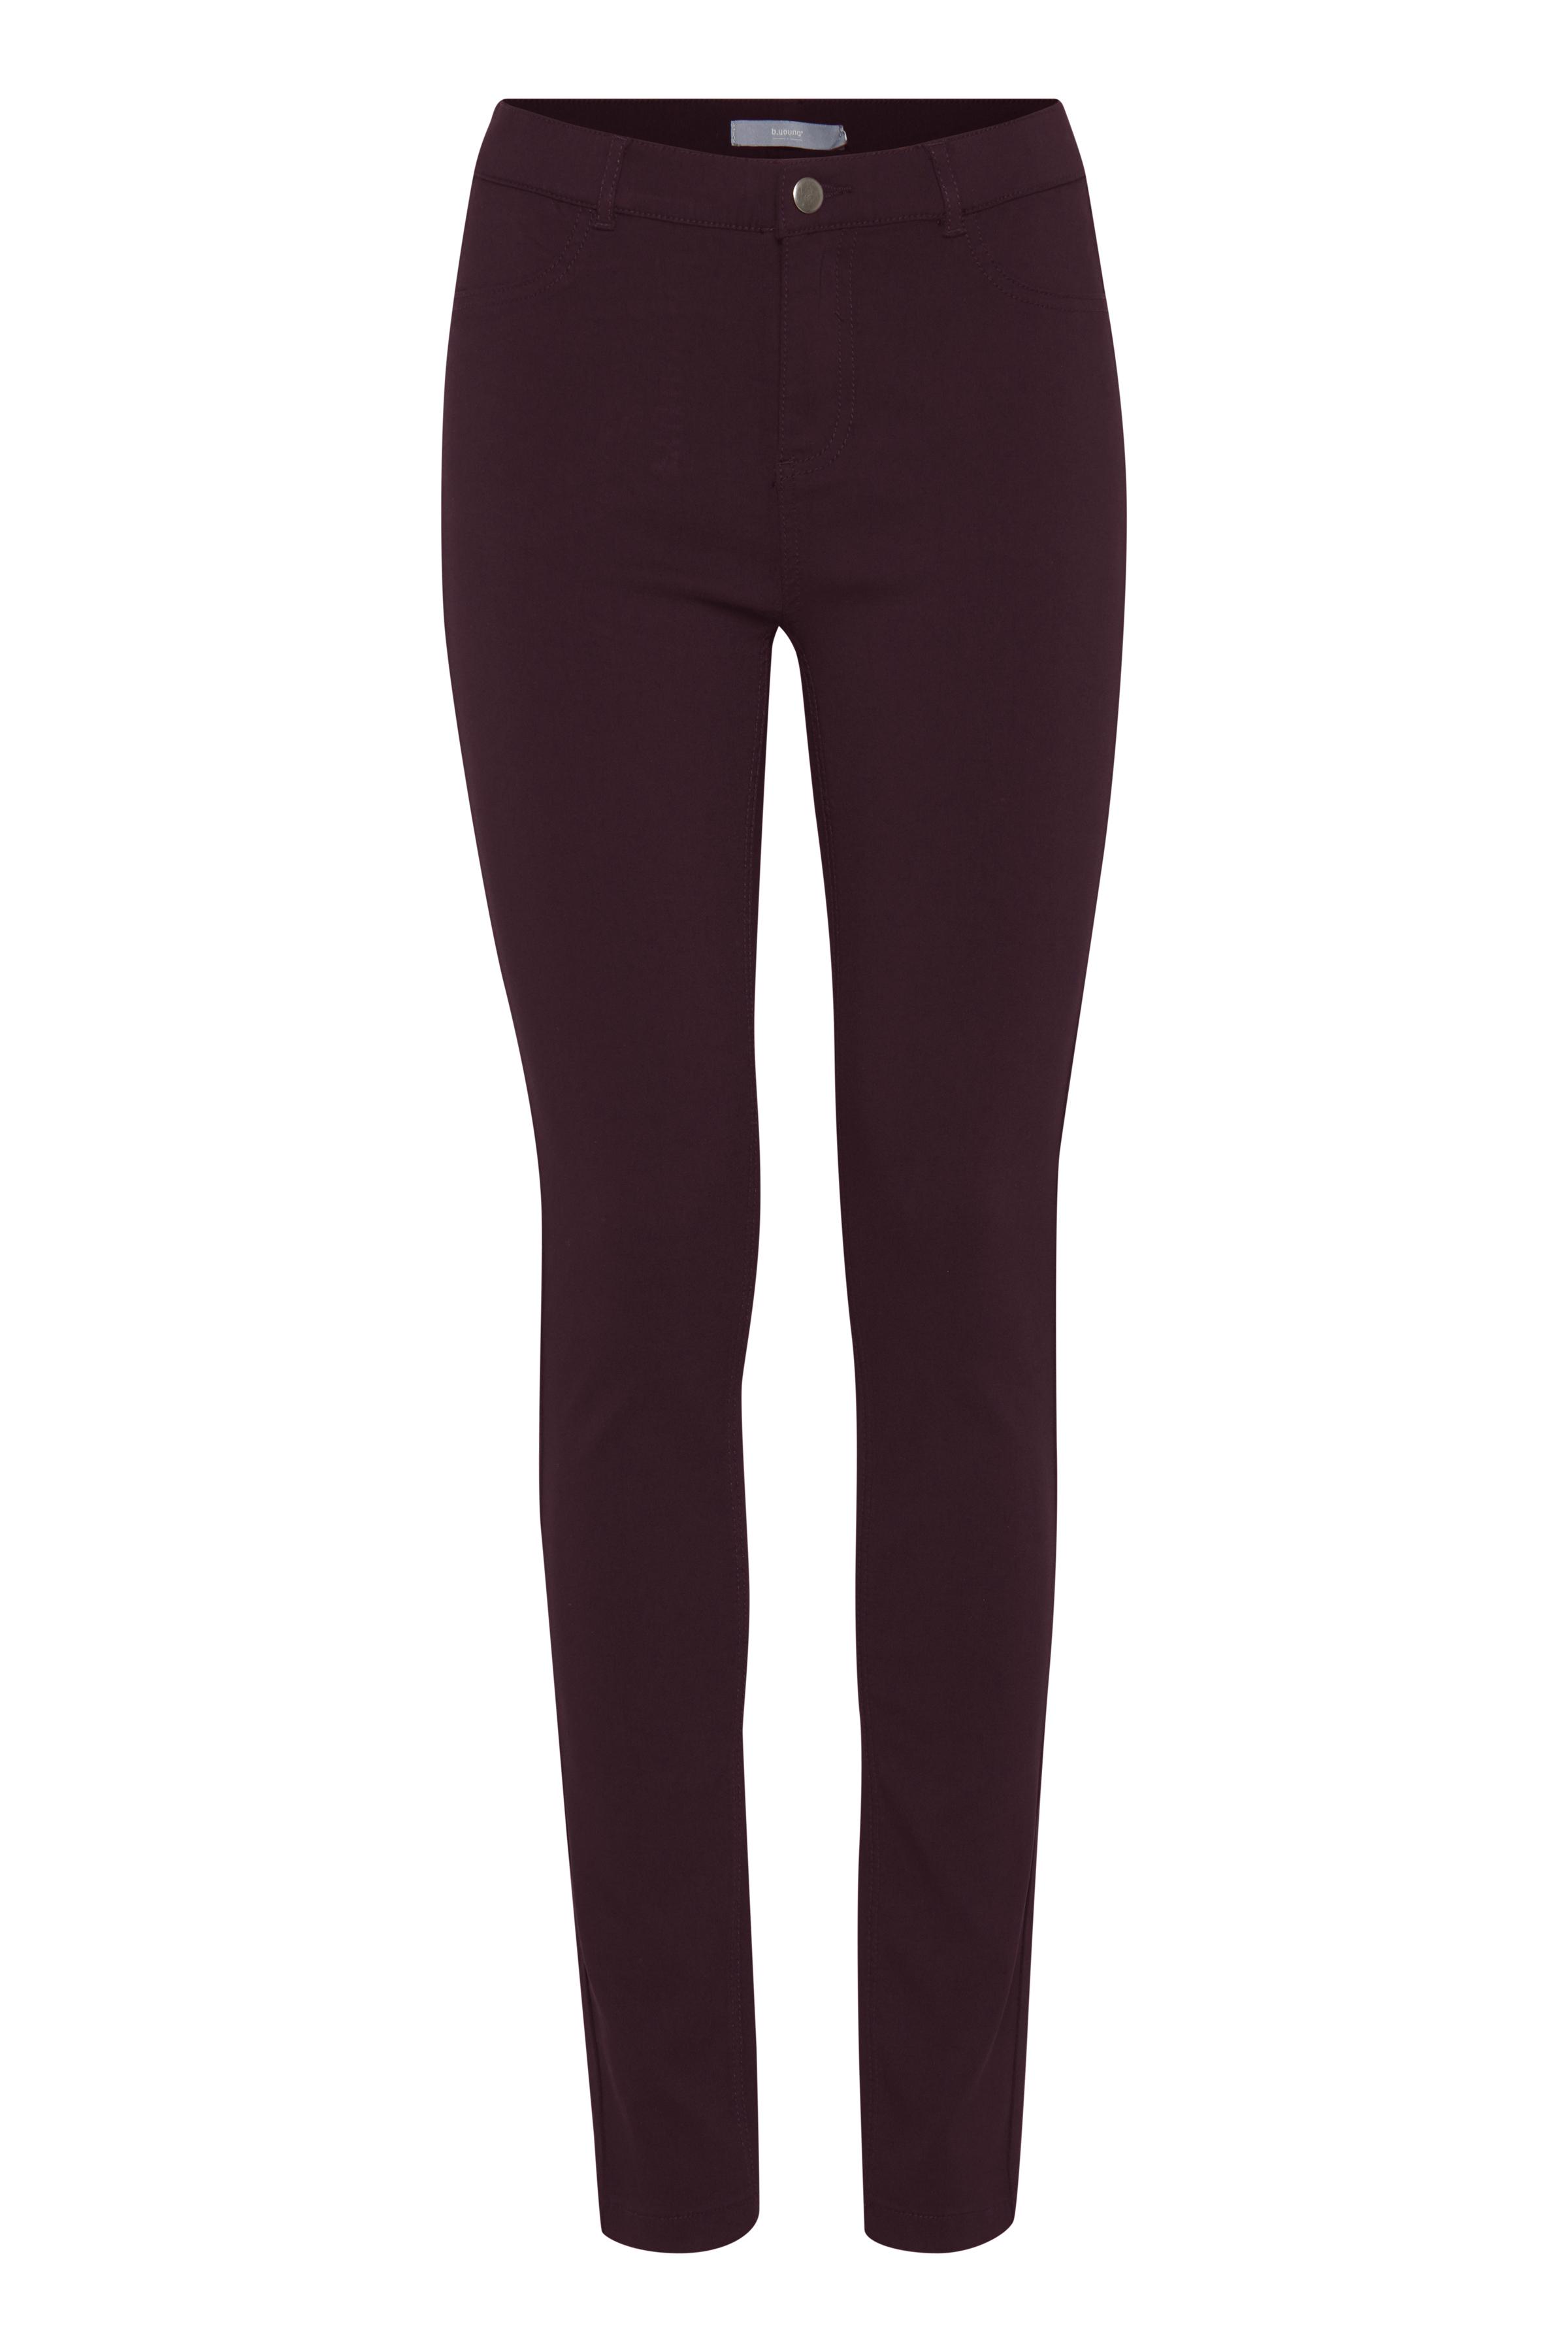 Beetroot Pants Casual fra b.young – Køb Beetroot Pants Casual fra str. 34-40 her